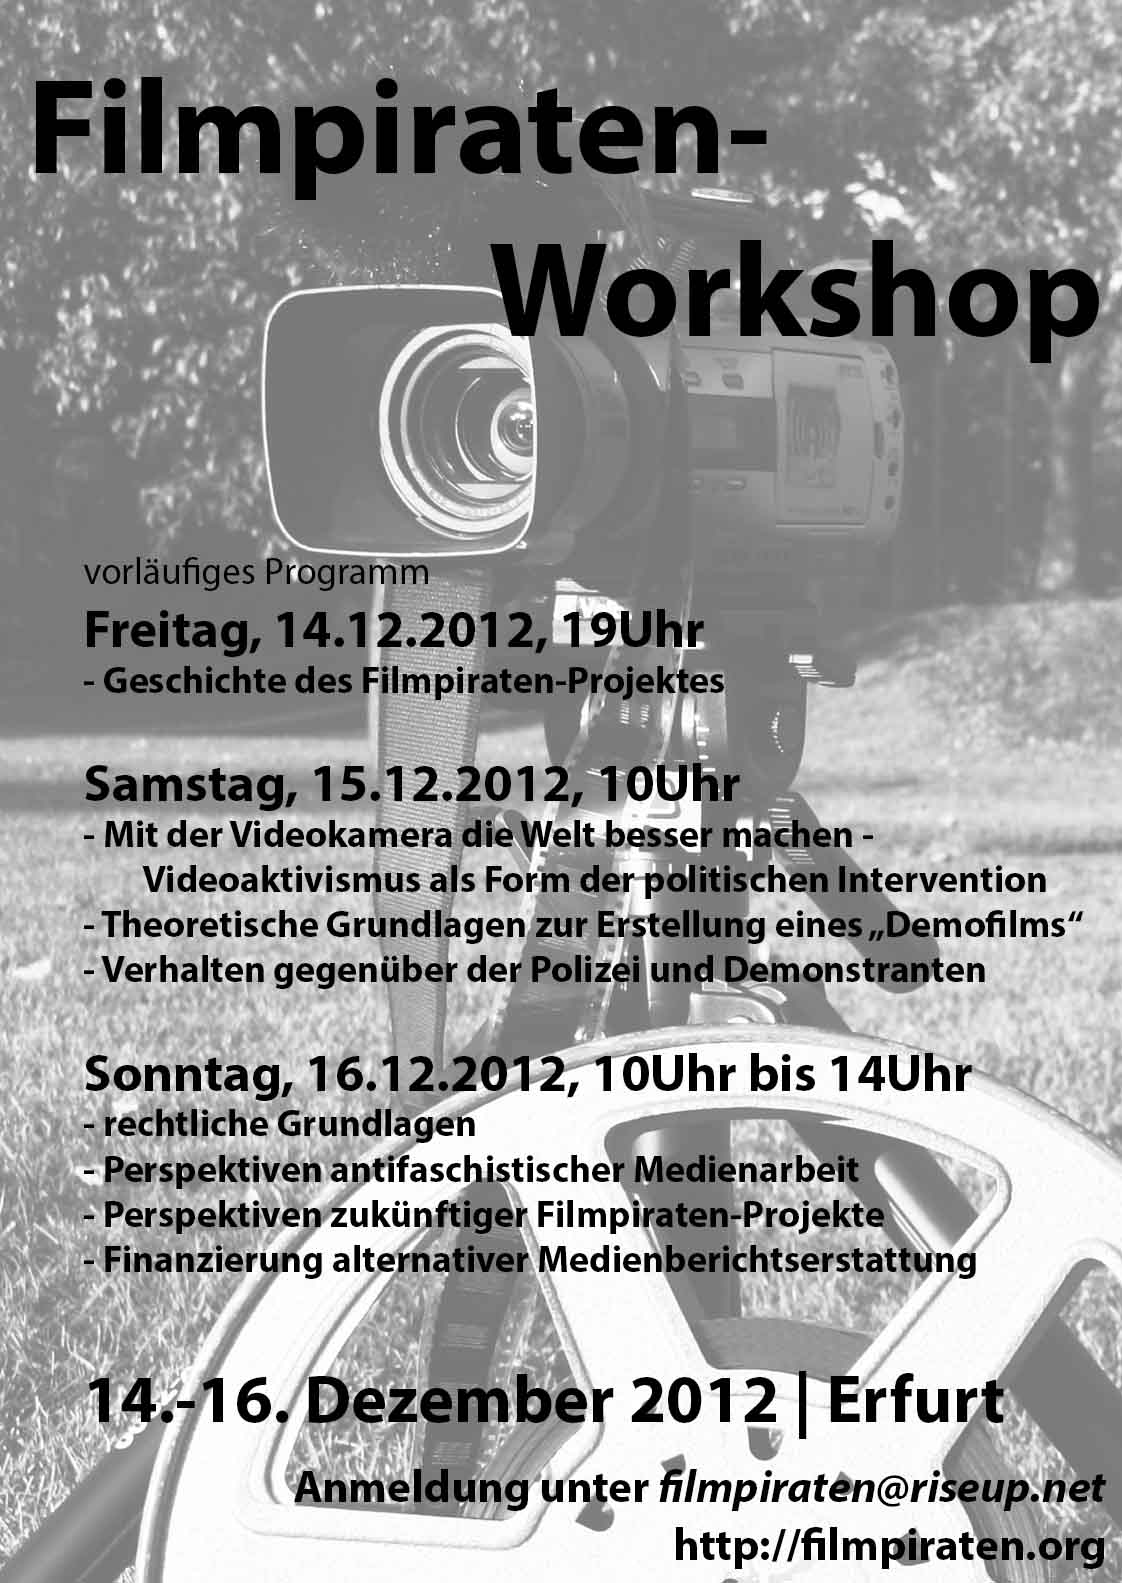 Filmpiraten-Workshop in Erfurt